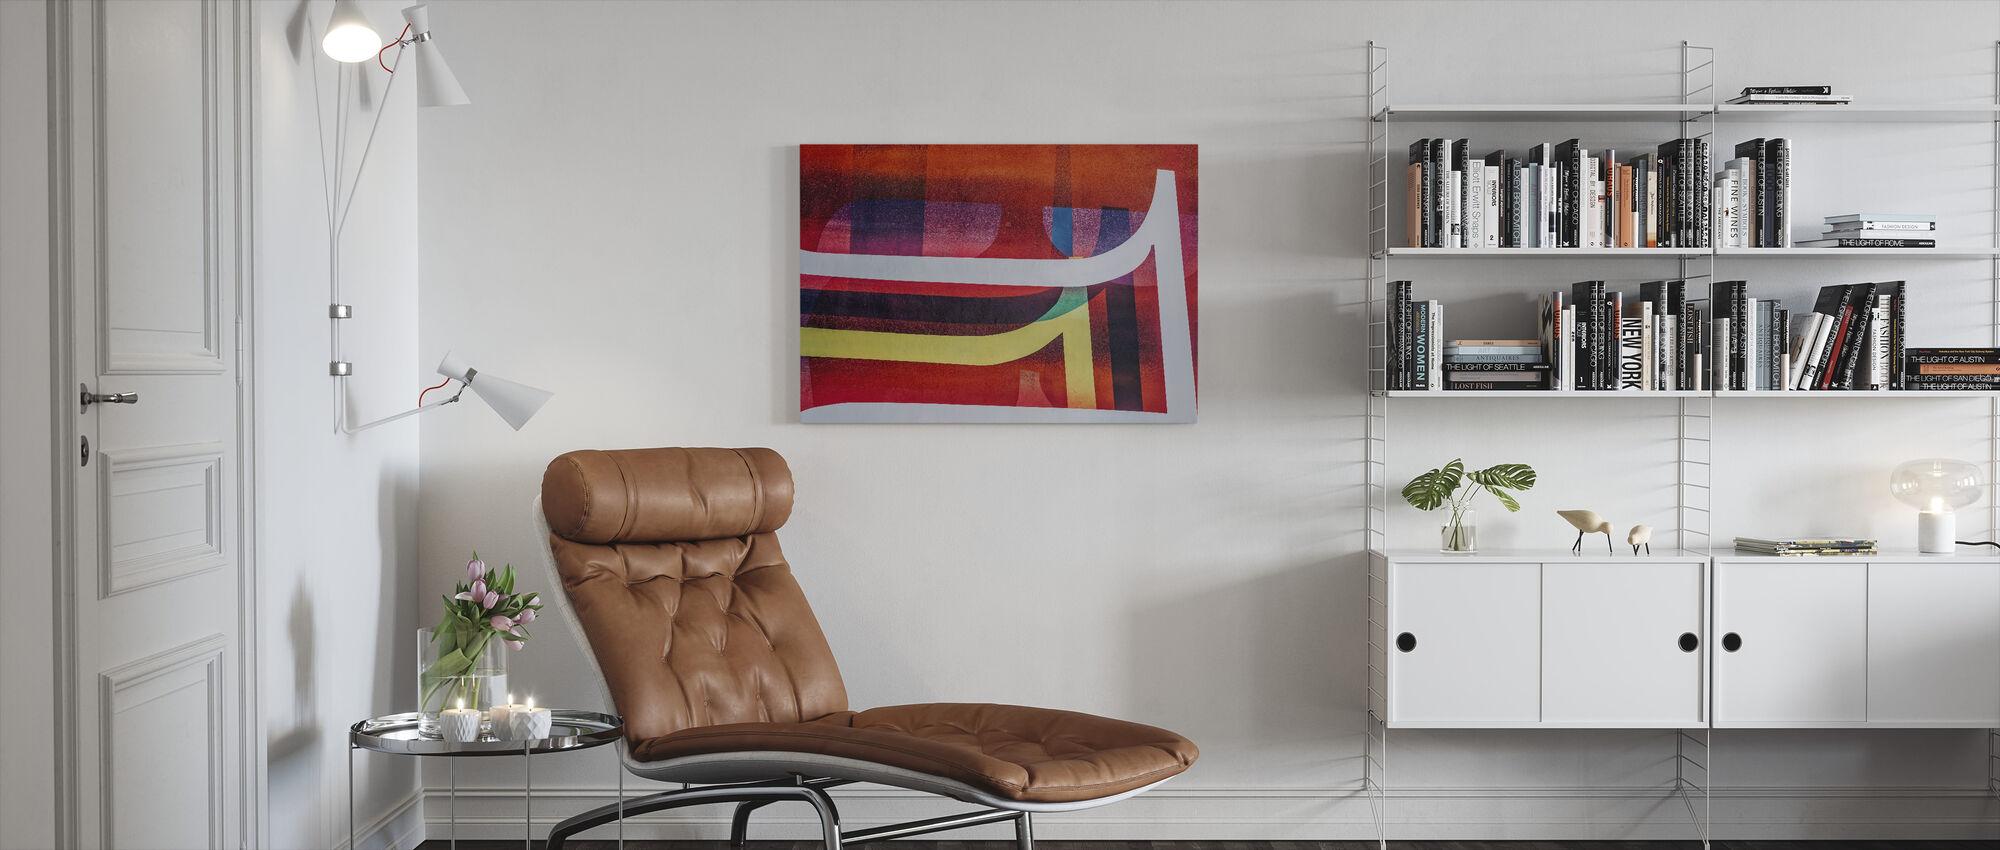 Arte visual - Lienzo - Salón